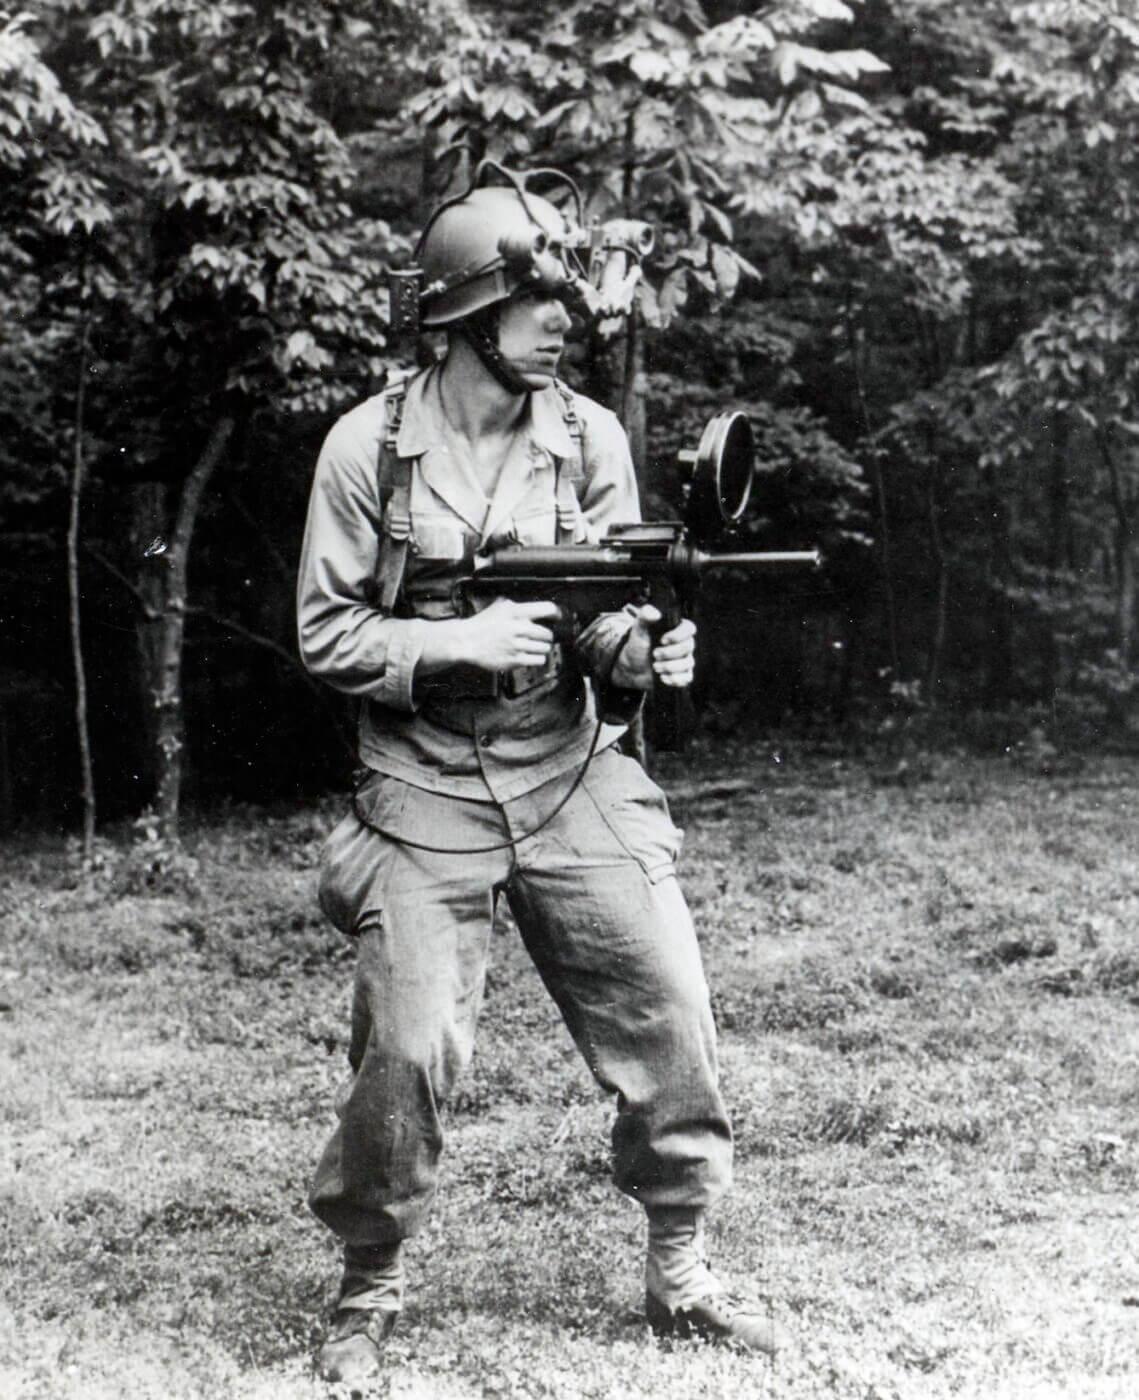 M3 SMG Sniperscope held by solider at Fort Belvoir, VA in November 1946